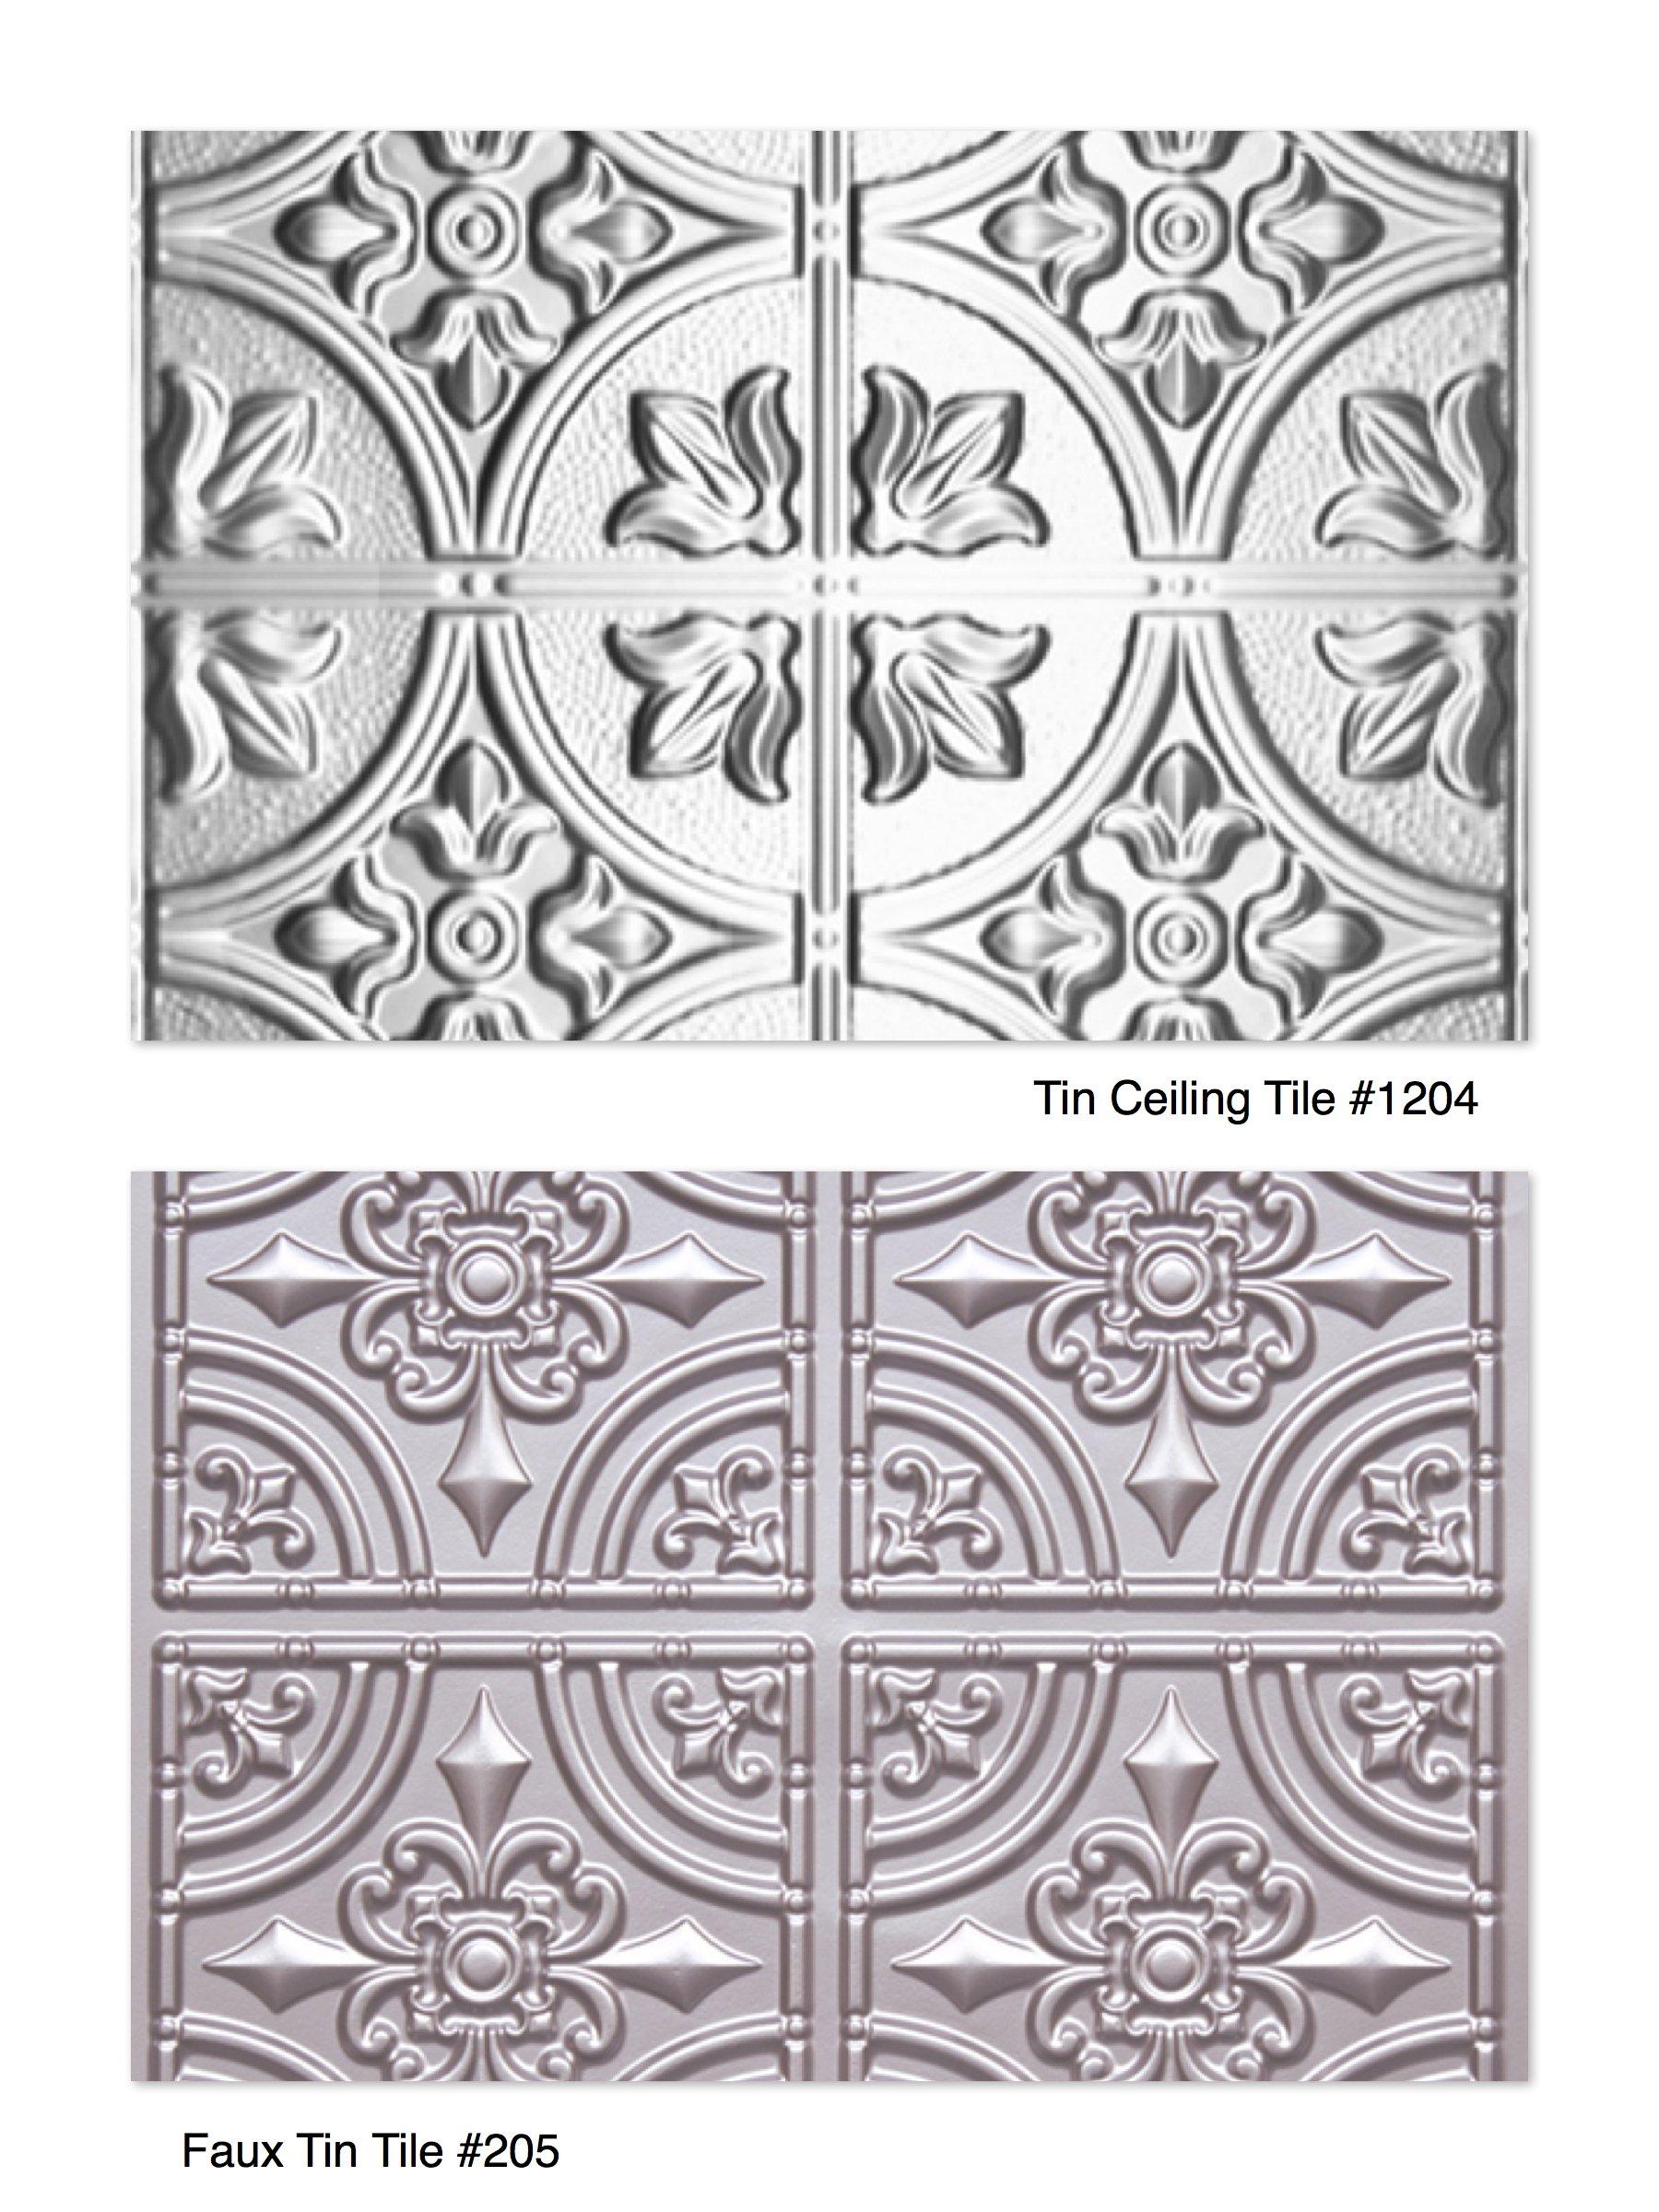 Decorative Tiles for Tin Backsplash & Kitchen Island on Property Brothers